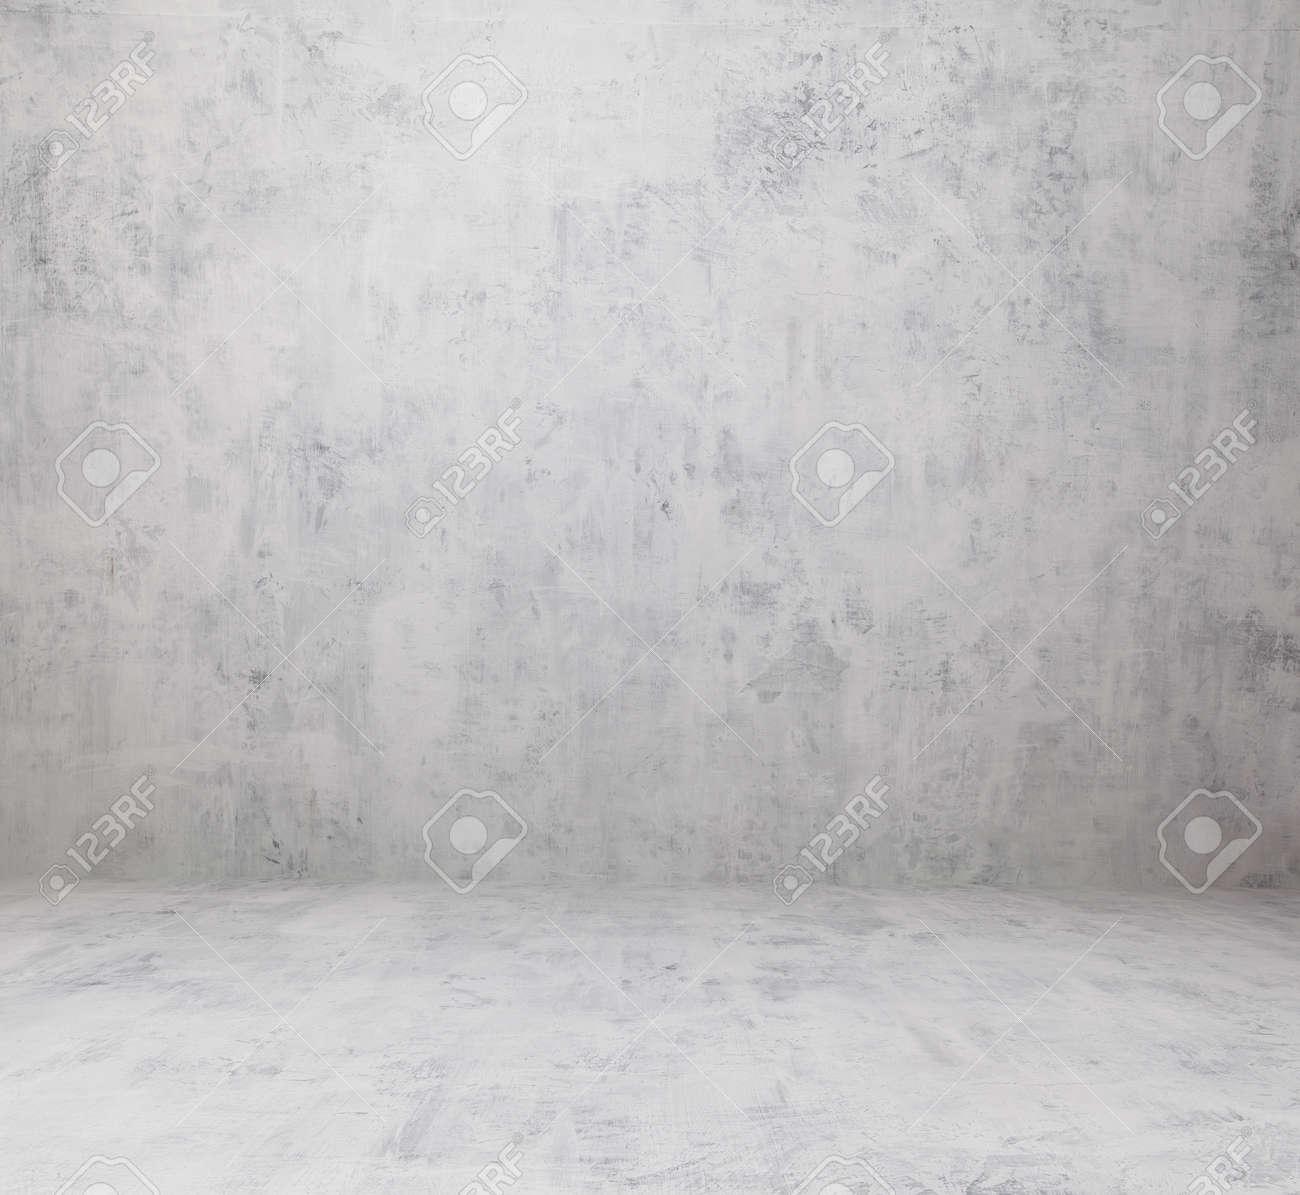 concrete wall texture lit up - 56812472